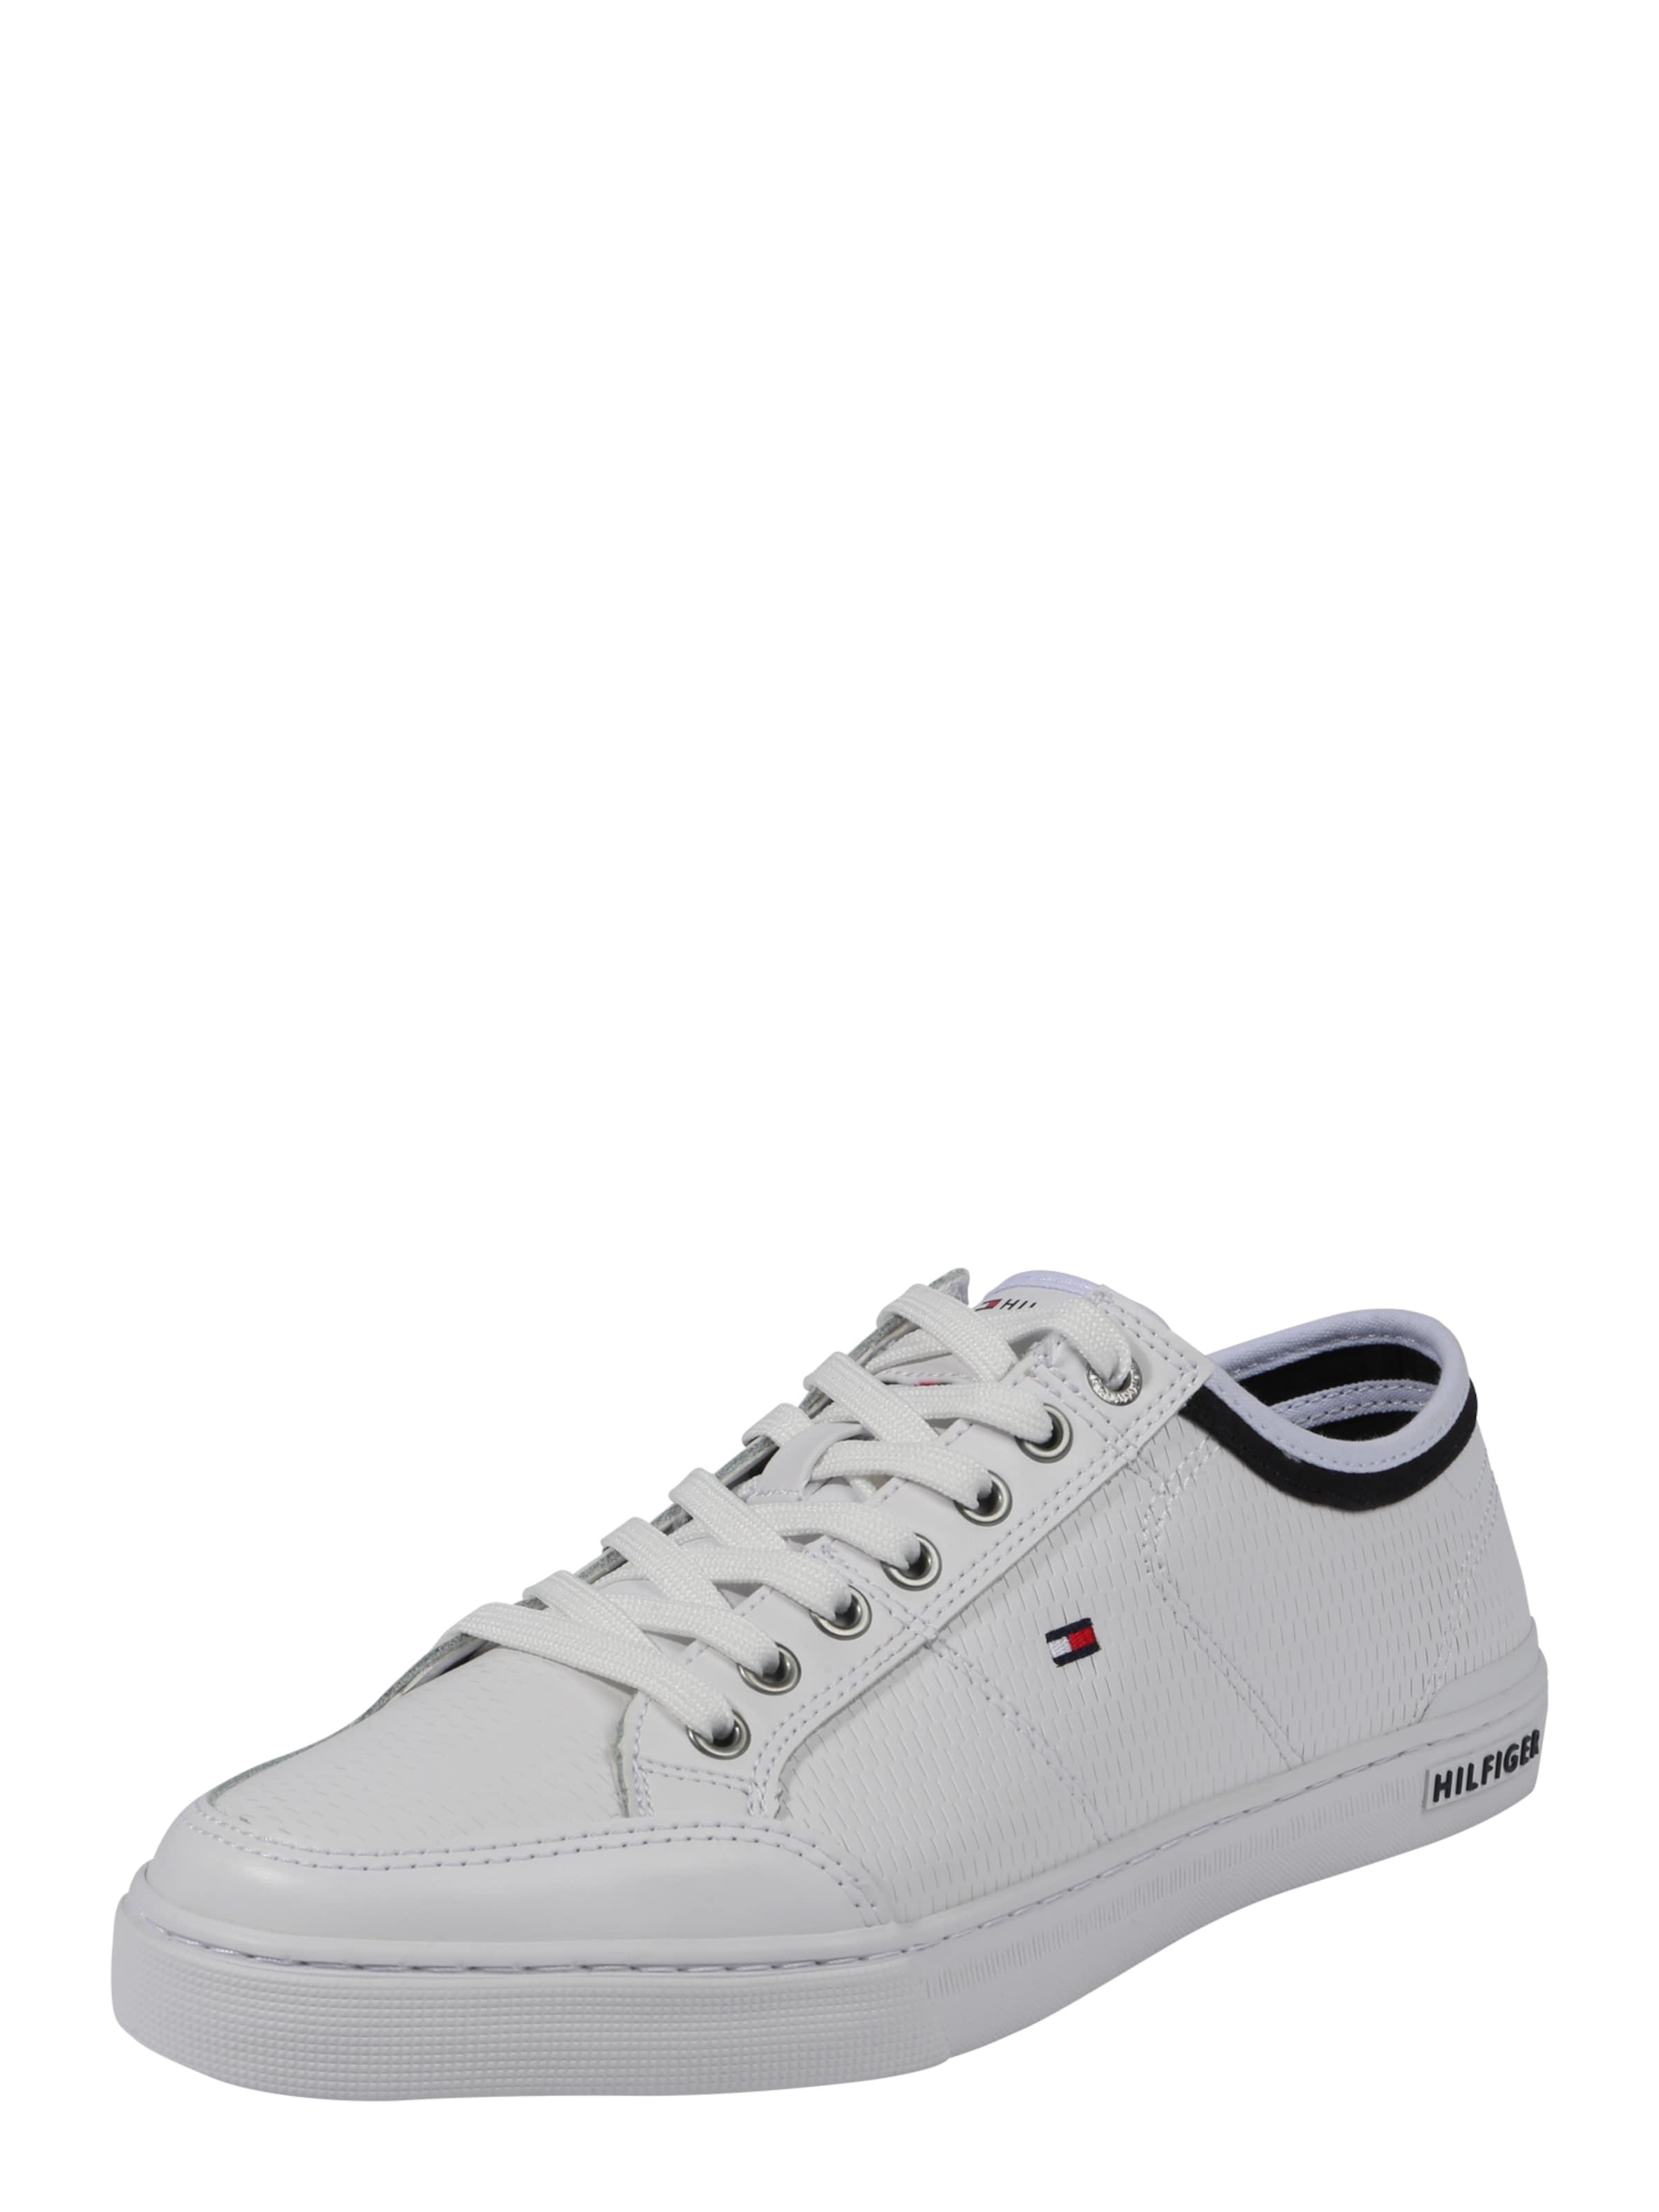 TOMMY HILFIGER Sneaker CORE CORPORATE Hohe Qualität